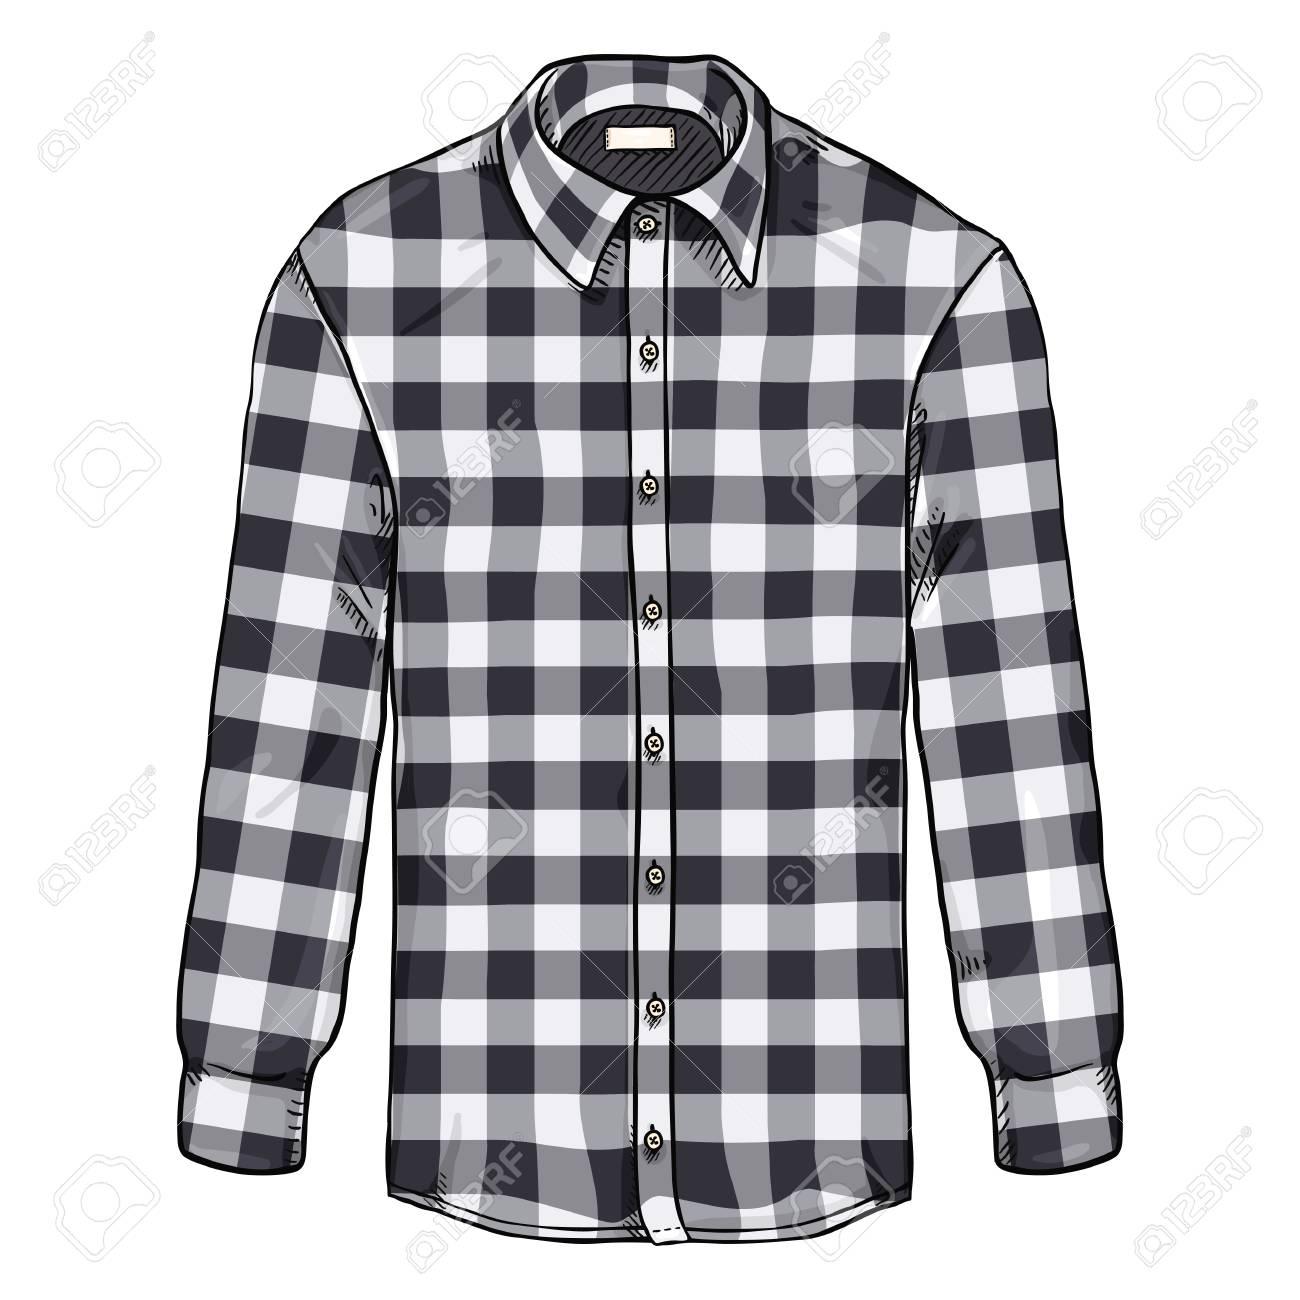 5cd2a21d215 Vector Cartoon Long Sleeve Black and White Checkered Men Shirt